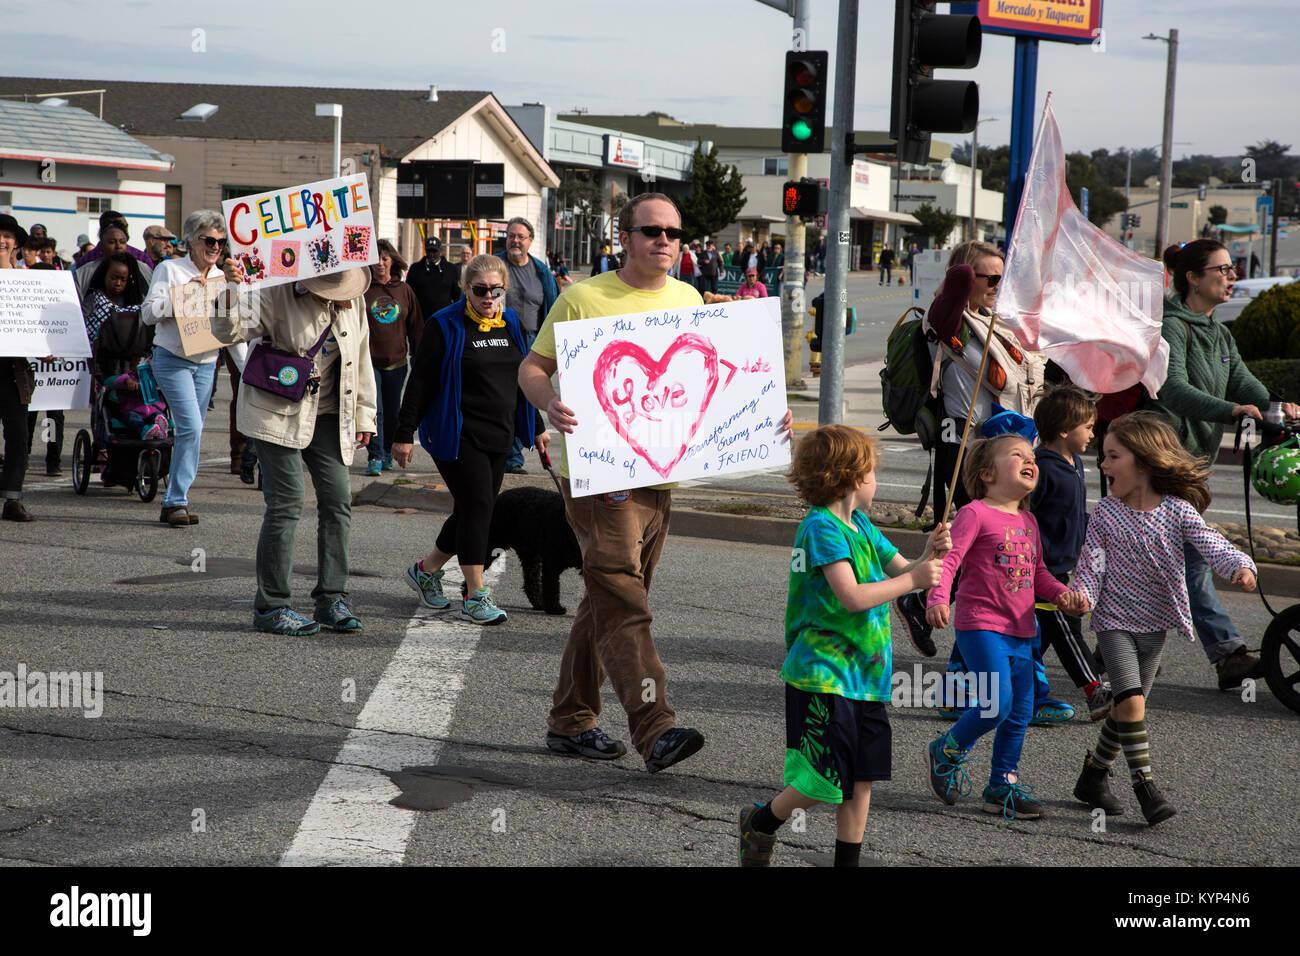 Seaside, California, USA. 15th Jan, 2018. Martin Luther King, Jr. Parade, Seaside, California, USA Credit: Tami - Stock Image